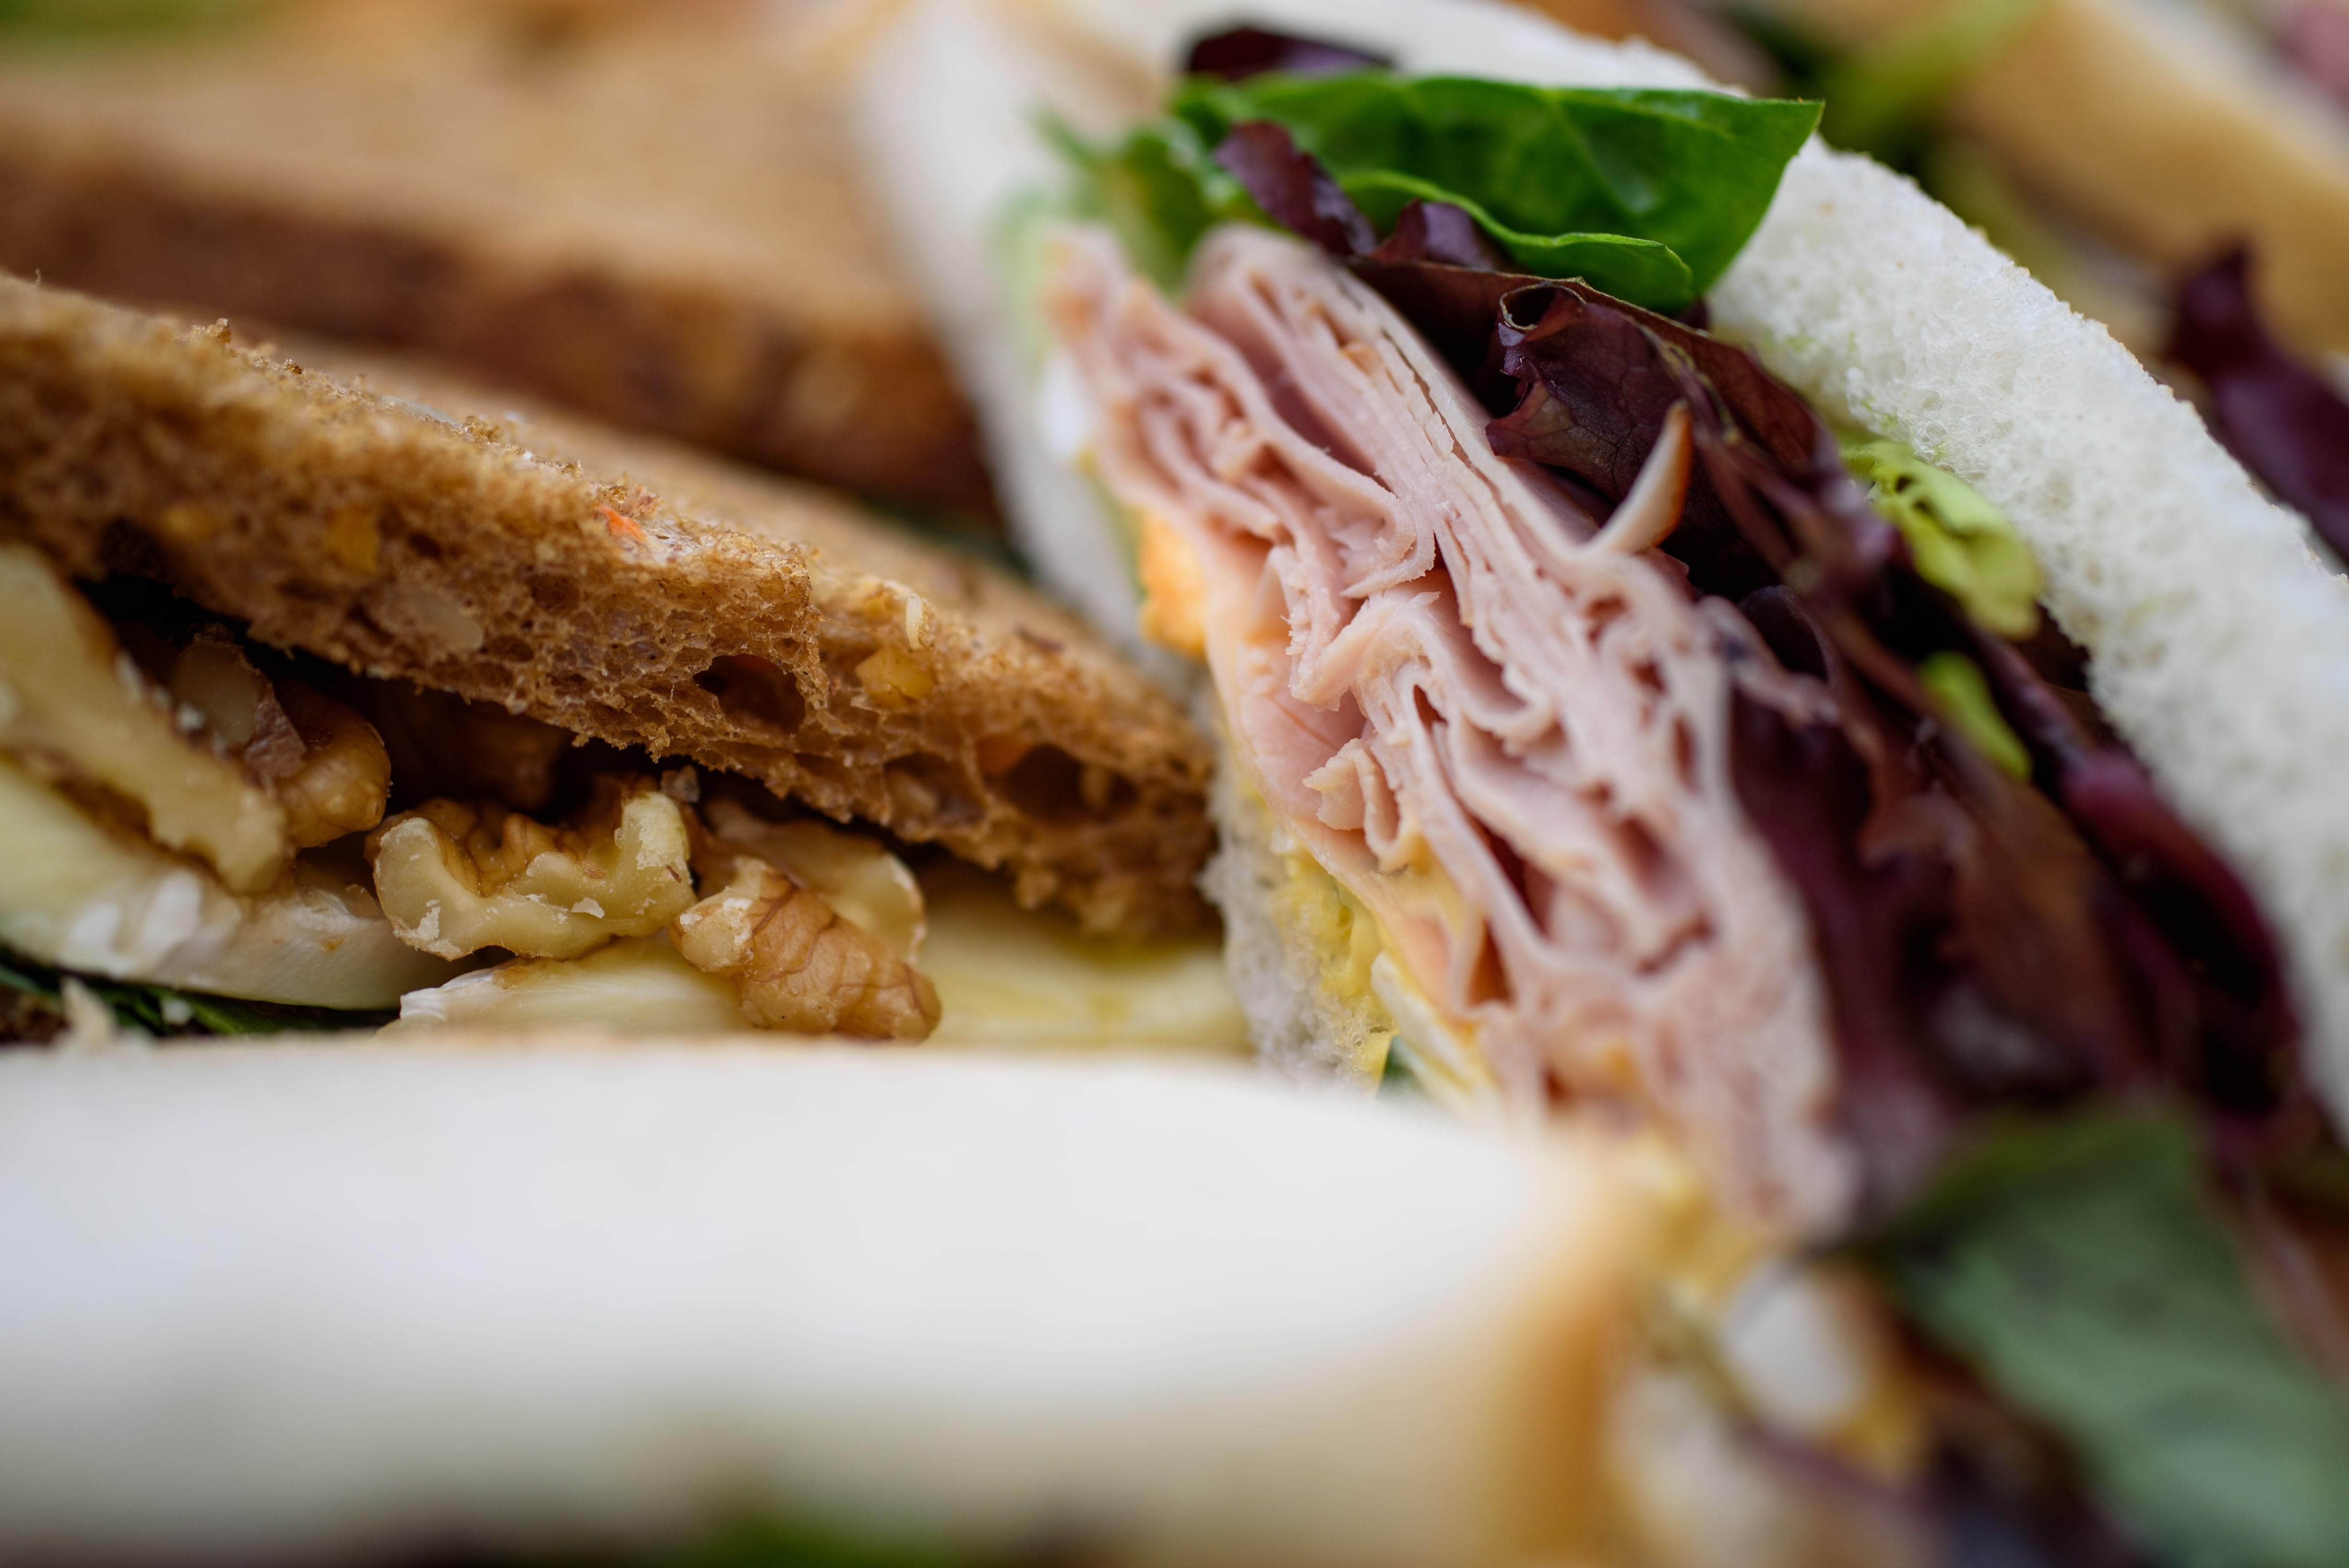 Sandwich basis